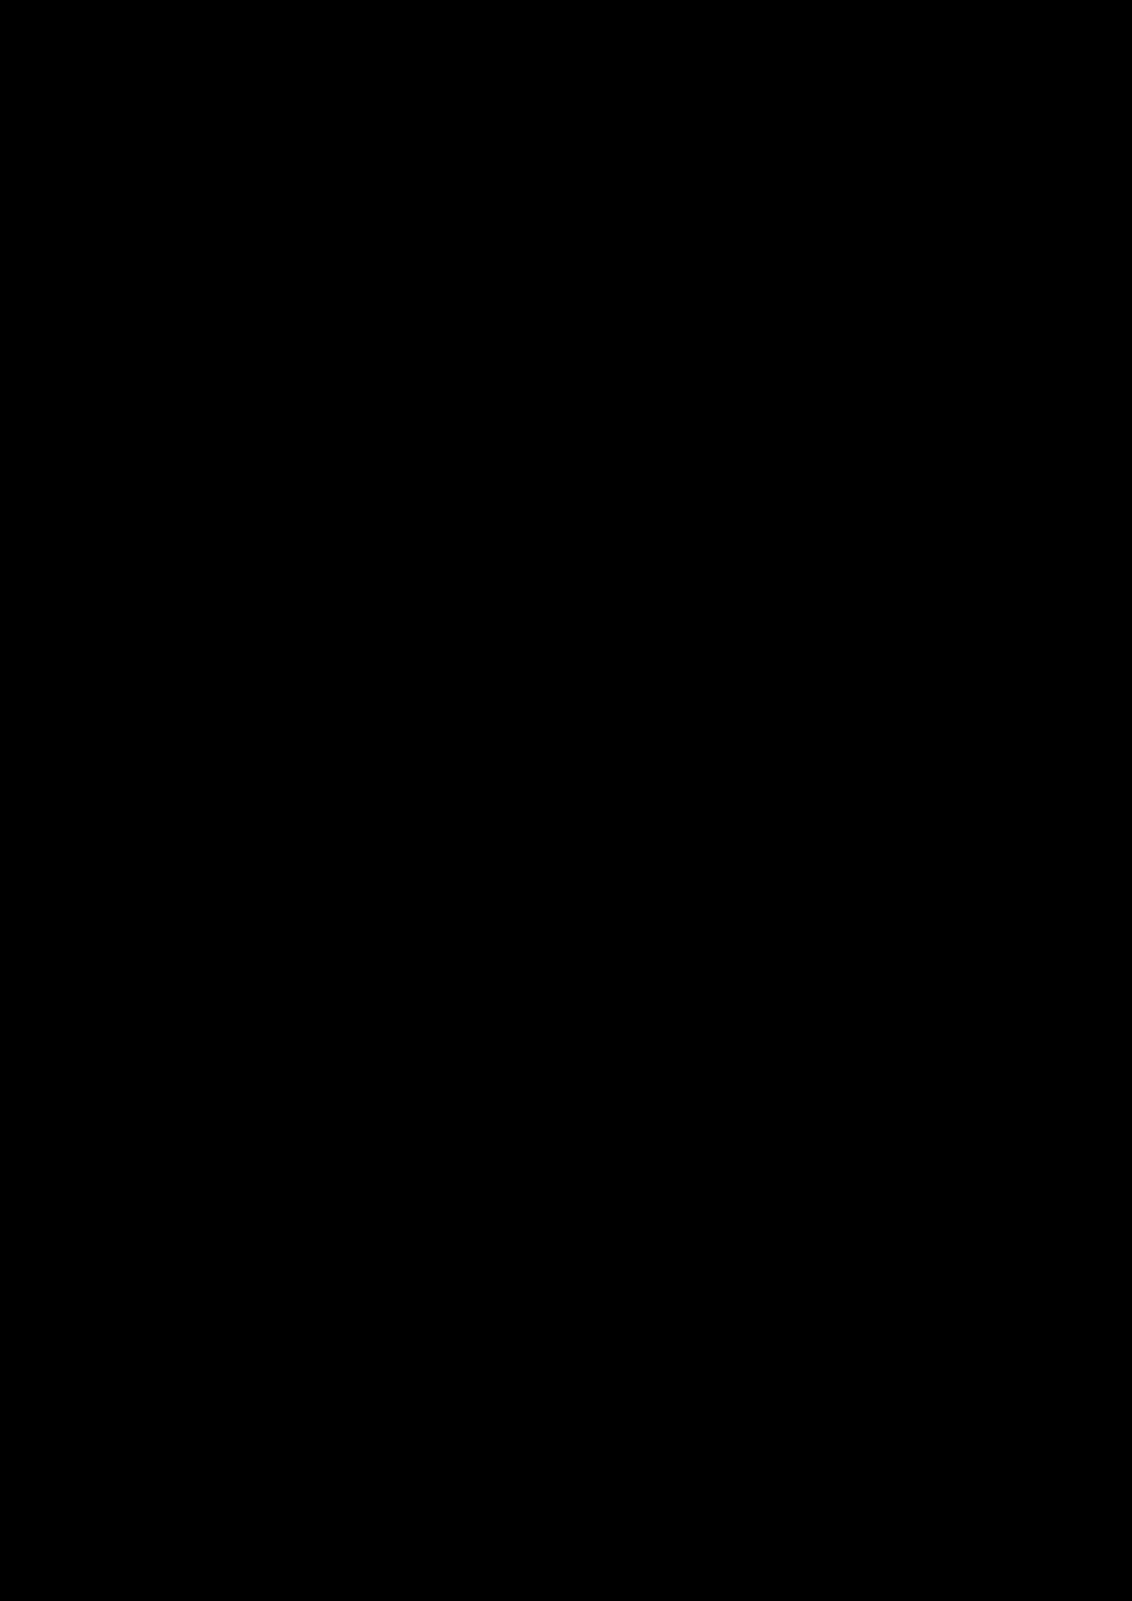 Belyiy sokol slide, Image 111